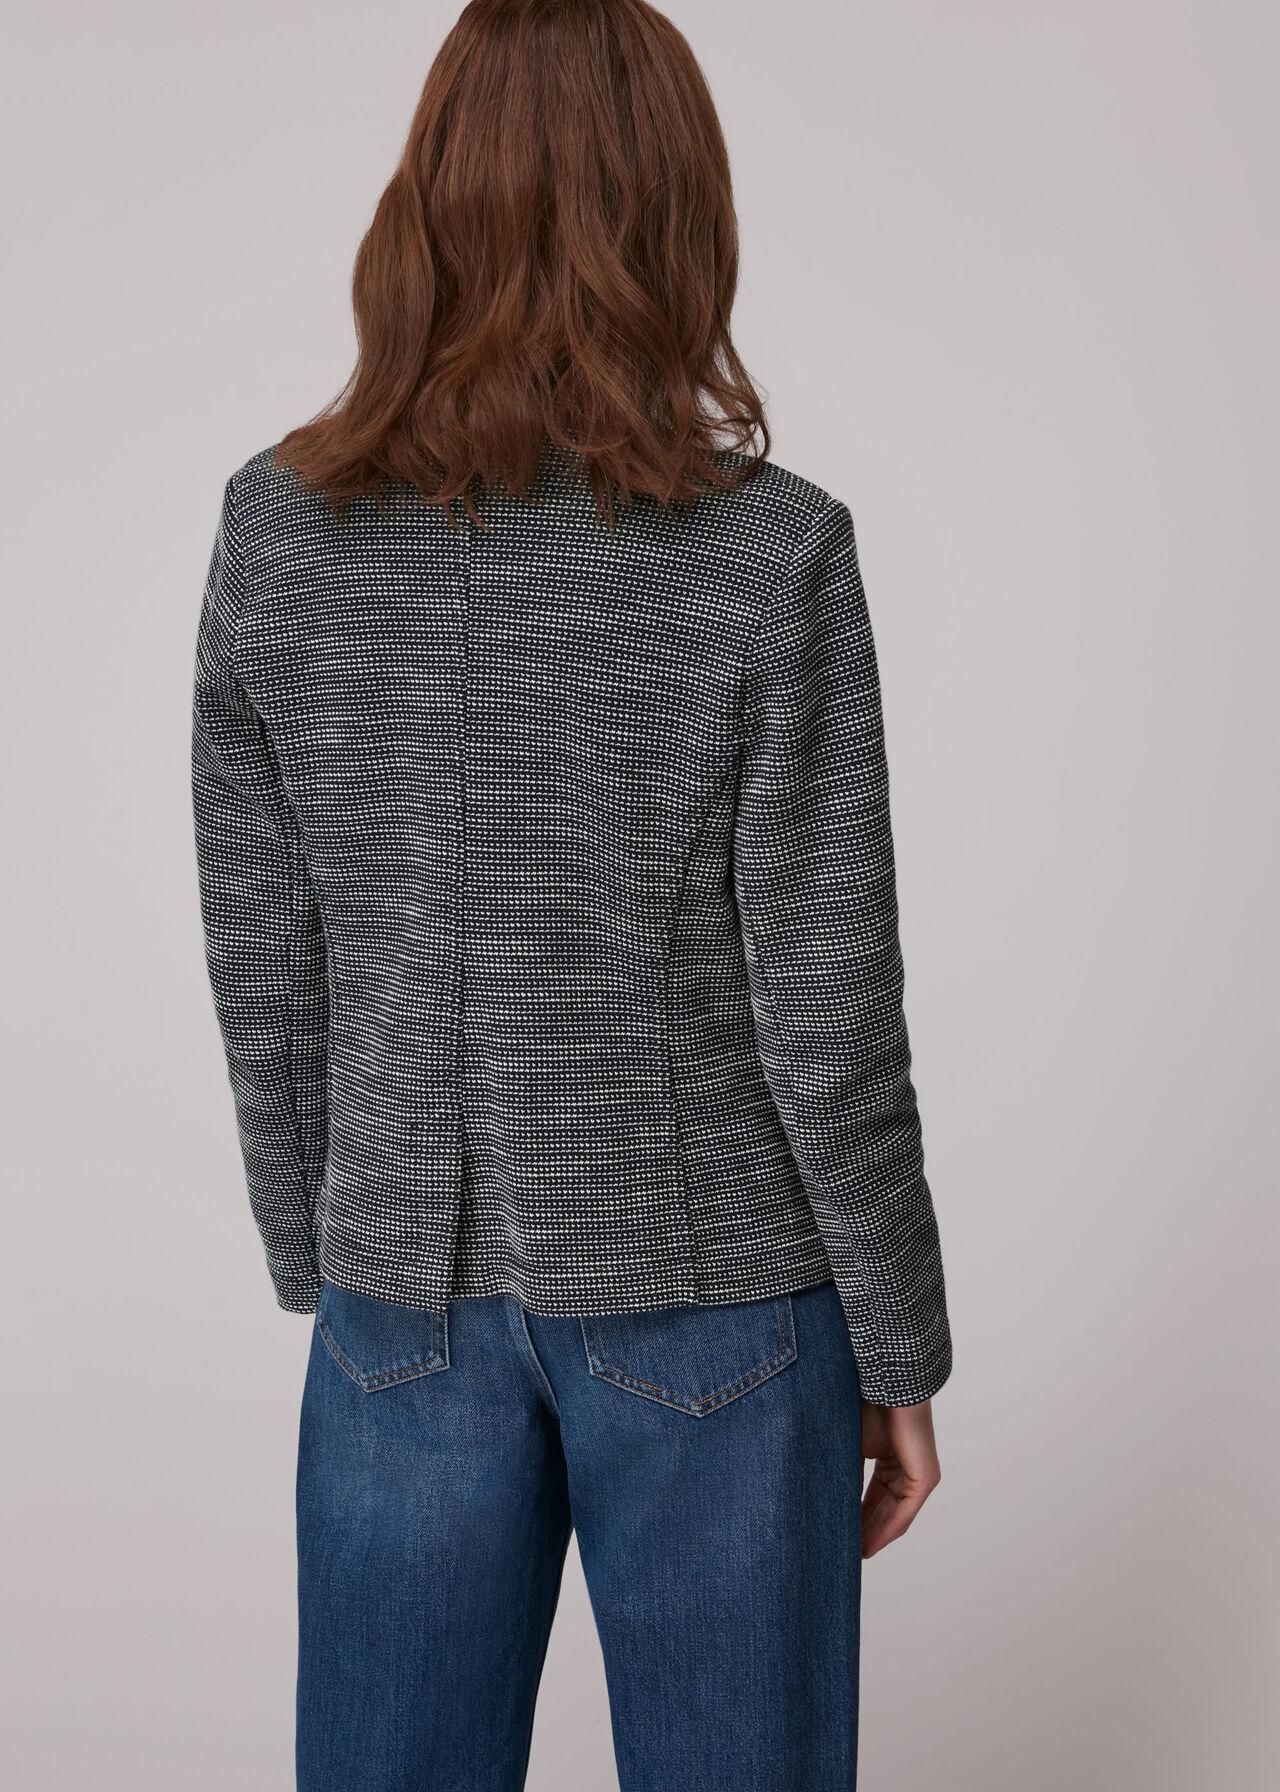 Tweed Slim Jersey Jacket